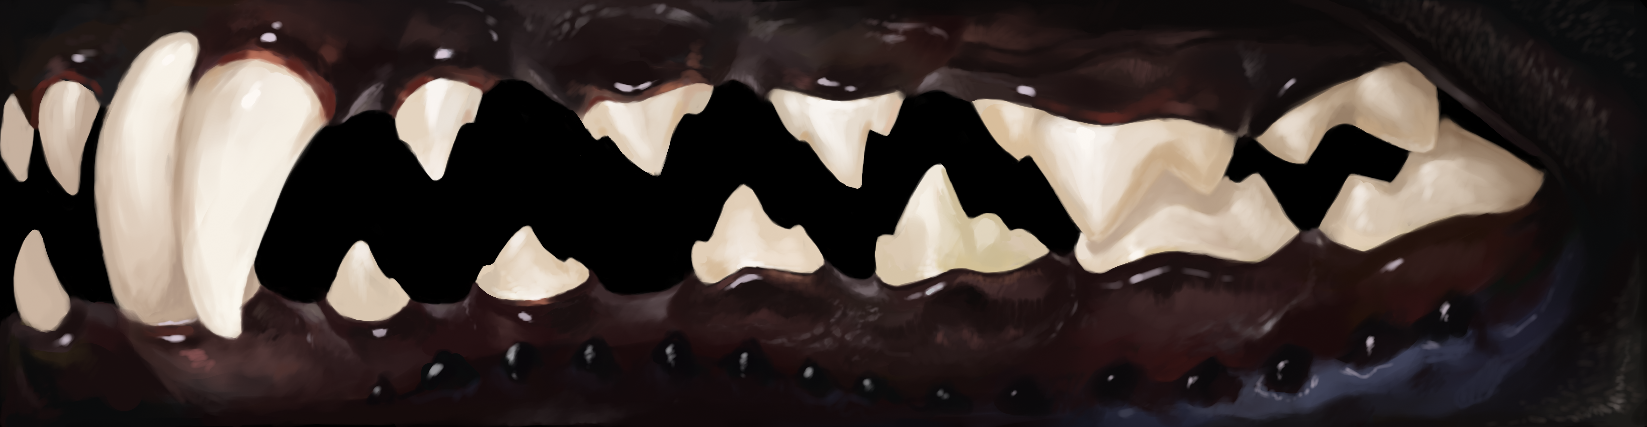 love draving teeth by Aspidal